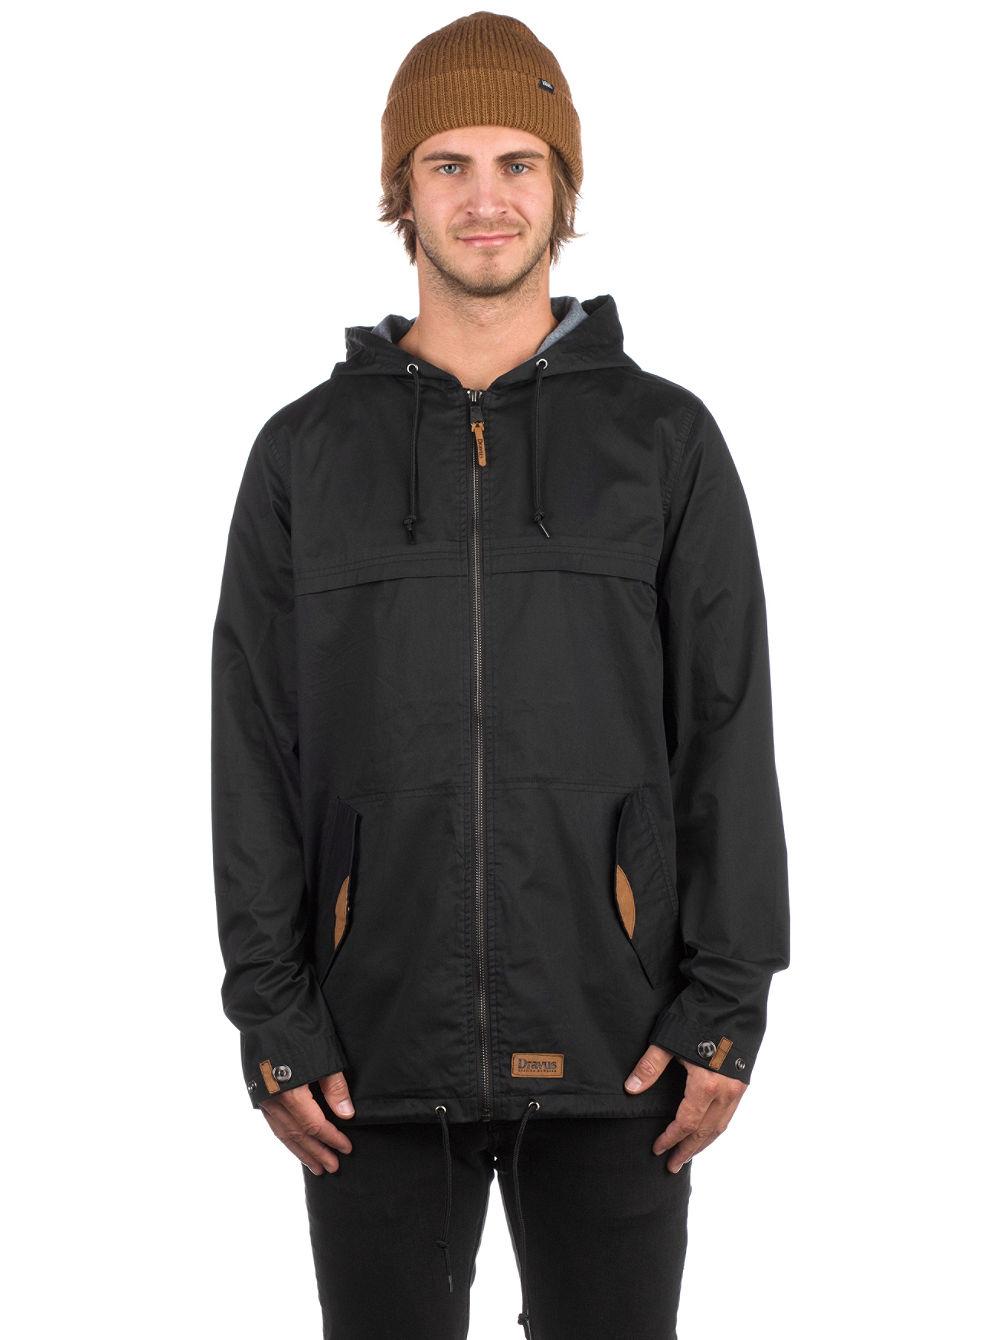 d36b02bae Buy Dravus Woodland Jacket online at Blue Tomato